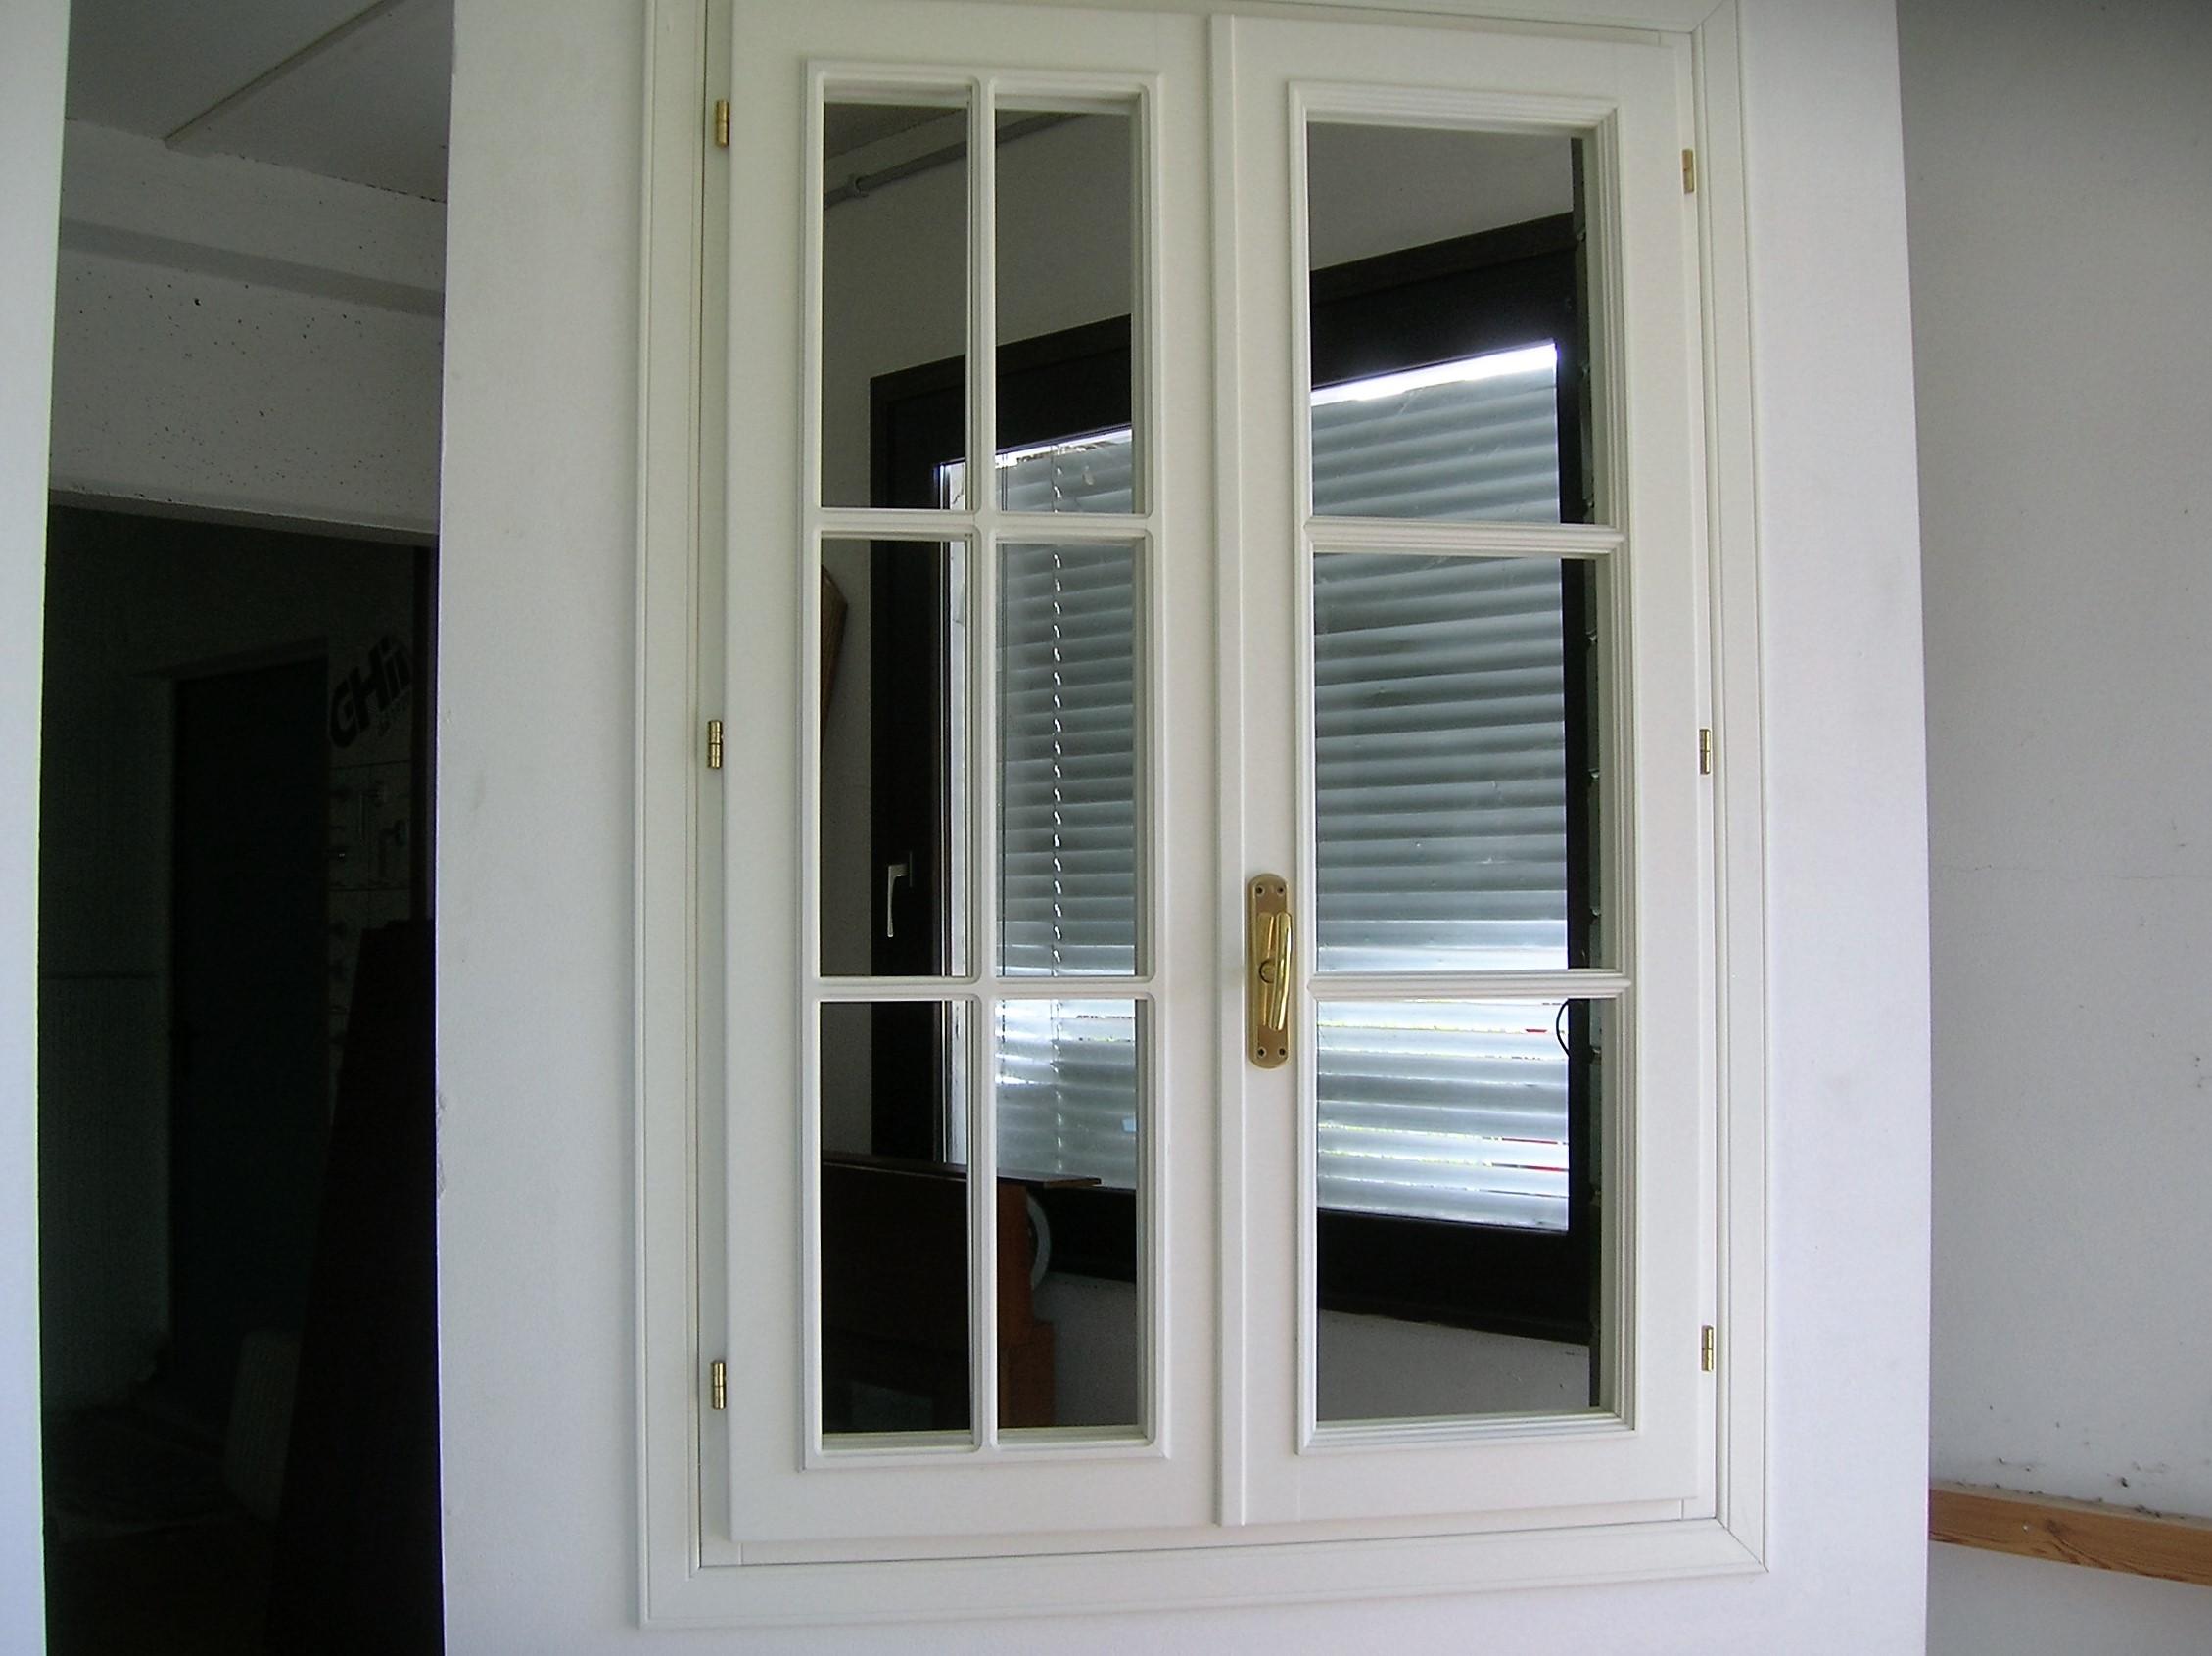 Infissi legno mcd arredamenti - Infissi e finestre ...